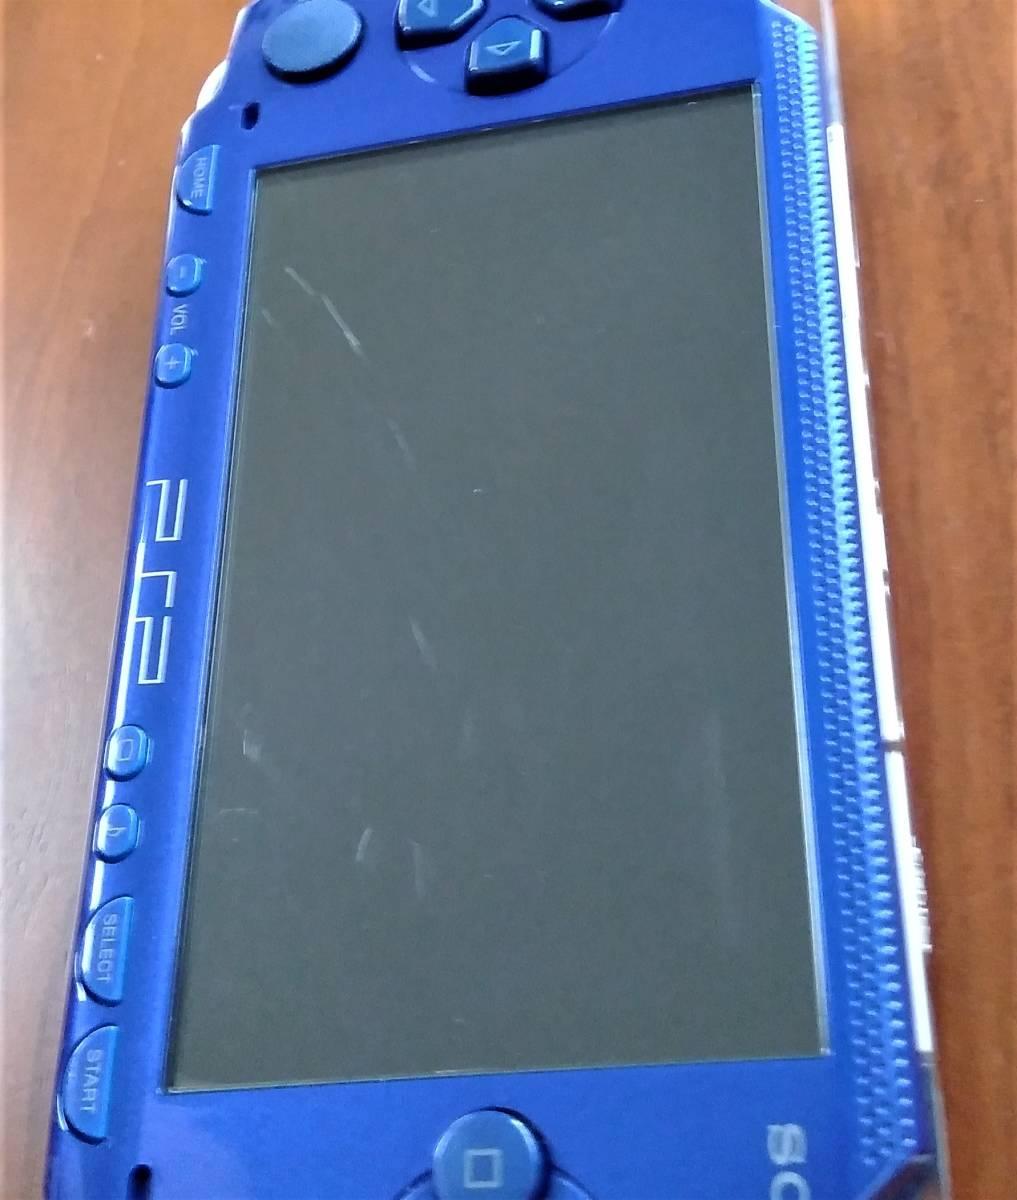 PSP1000本体メタリックブルー「テイルズ オブ ザ ワールド レディアント マイソロジー スペシャルパック」ソフト特典未開封未使用 動作OK!!_画像6